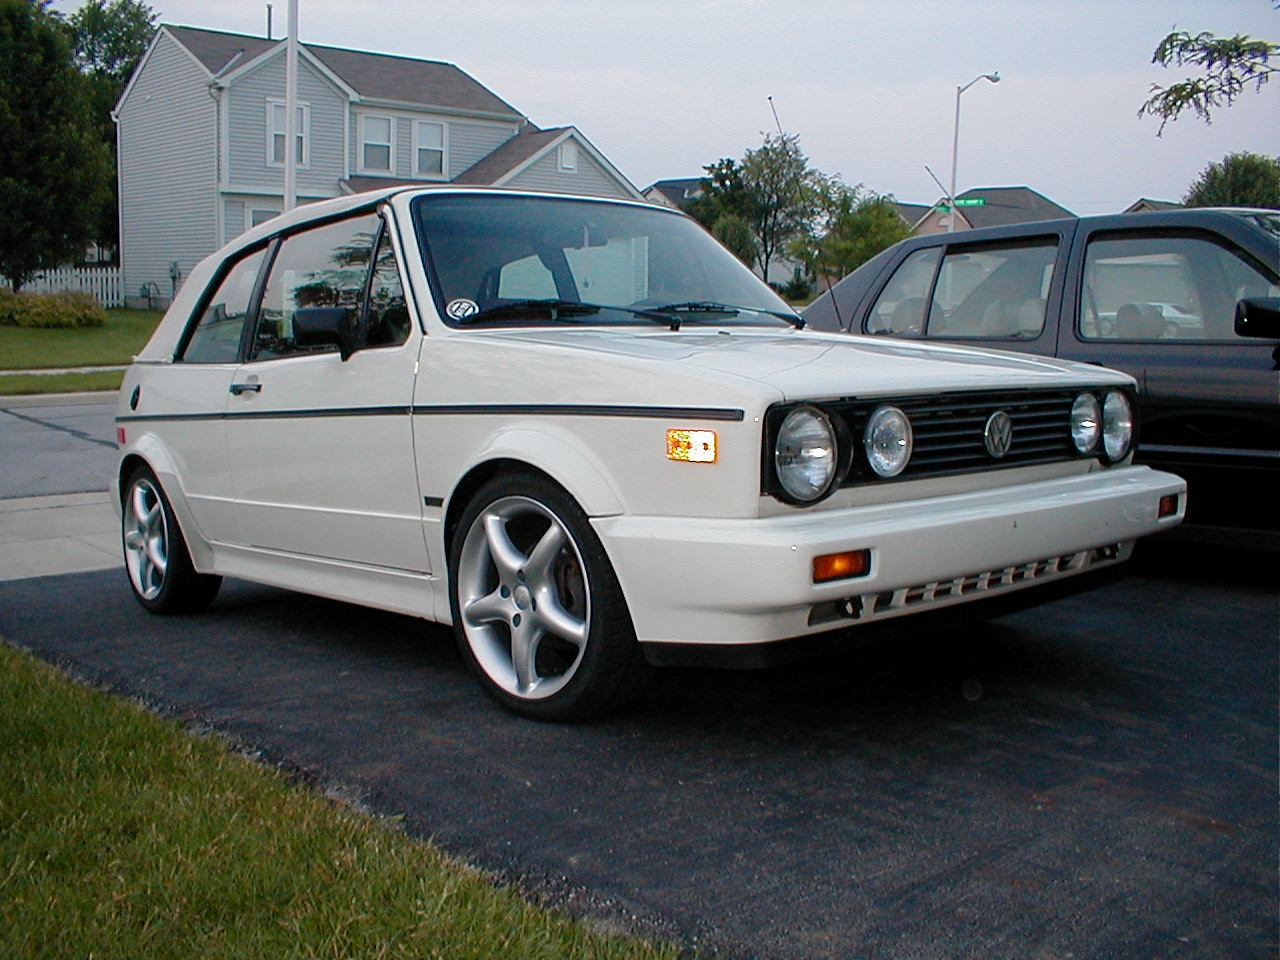 1990 Volkswagen Cabriolet Base Photo 2